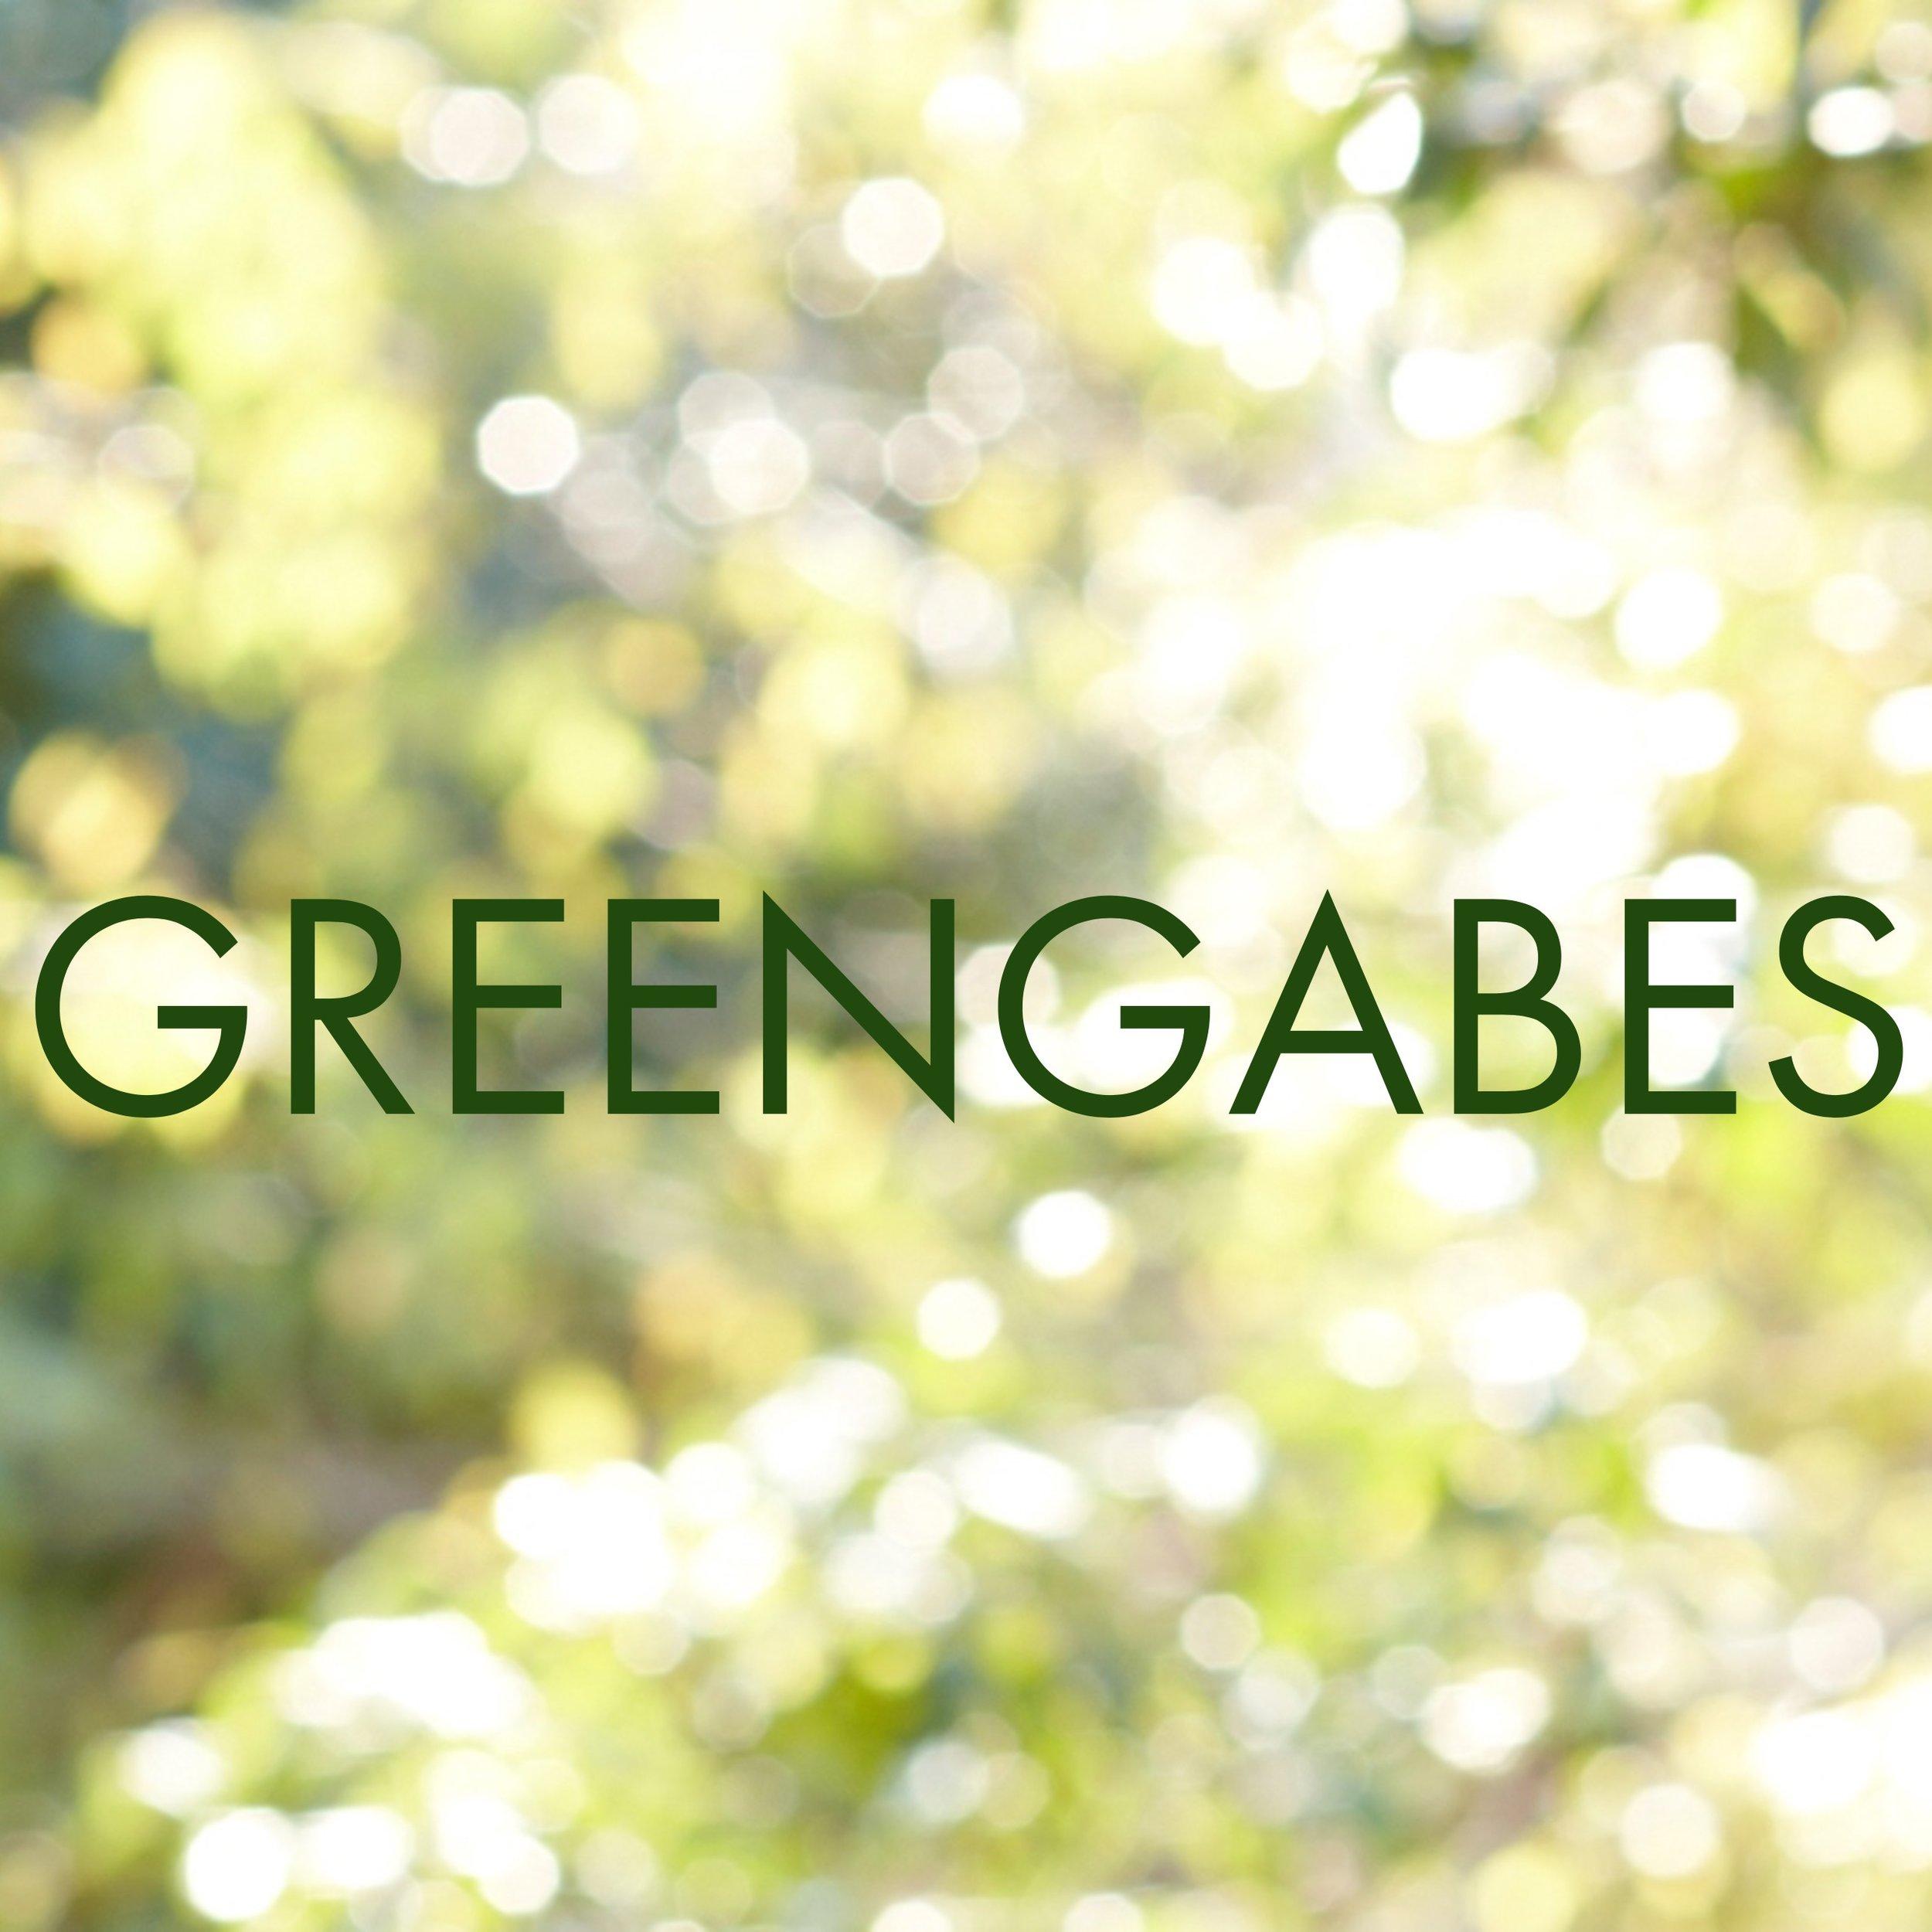 Greengabes